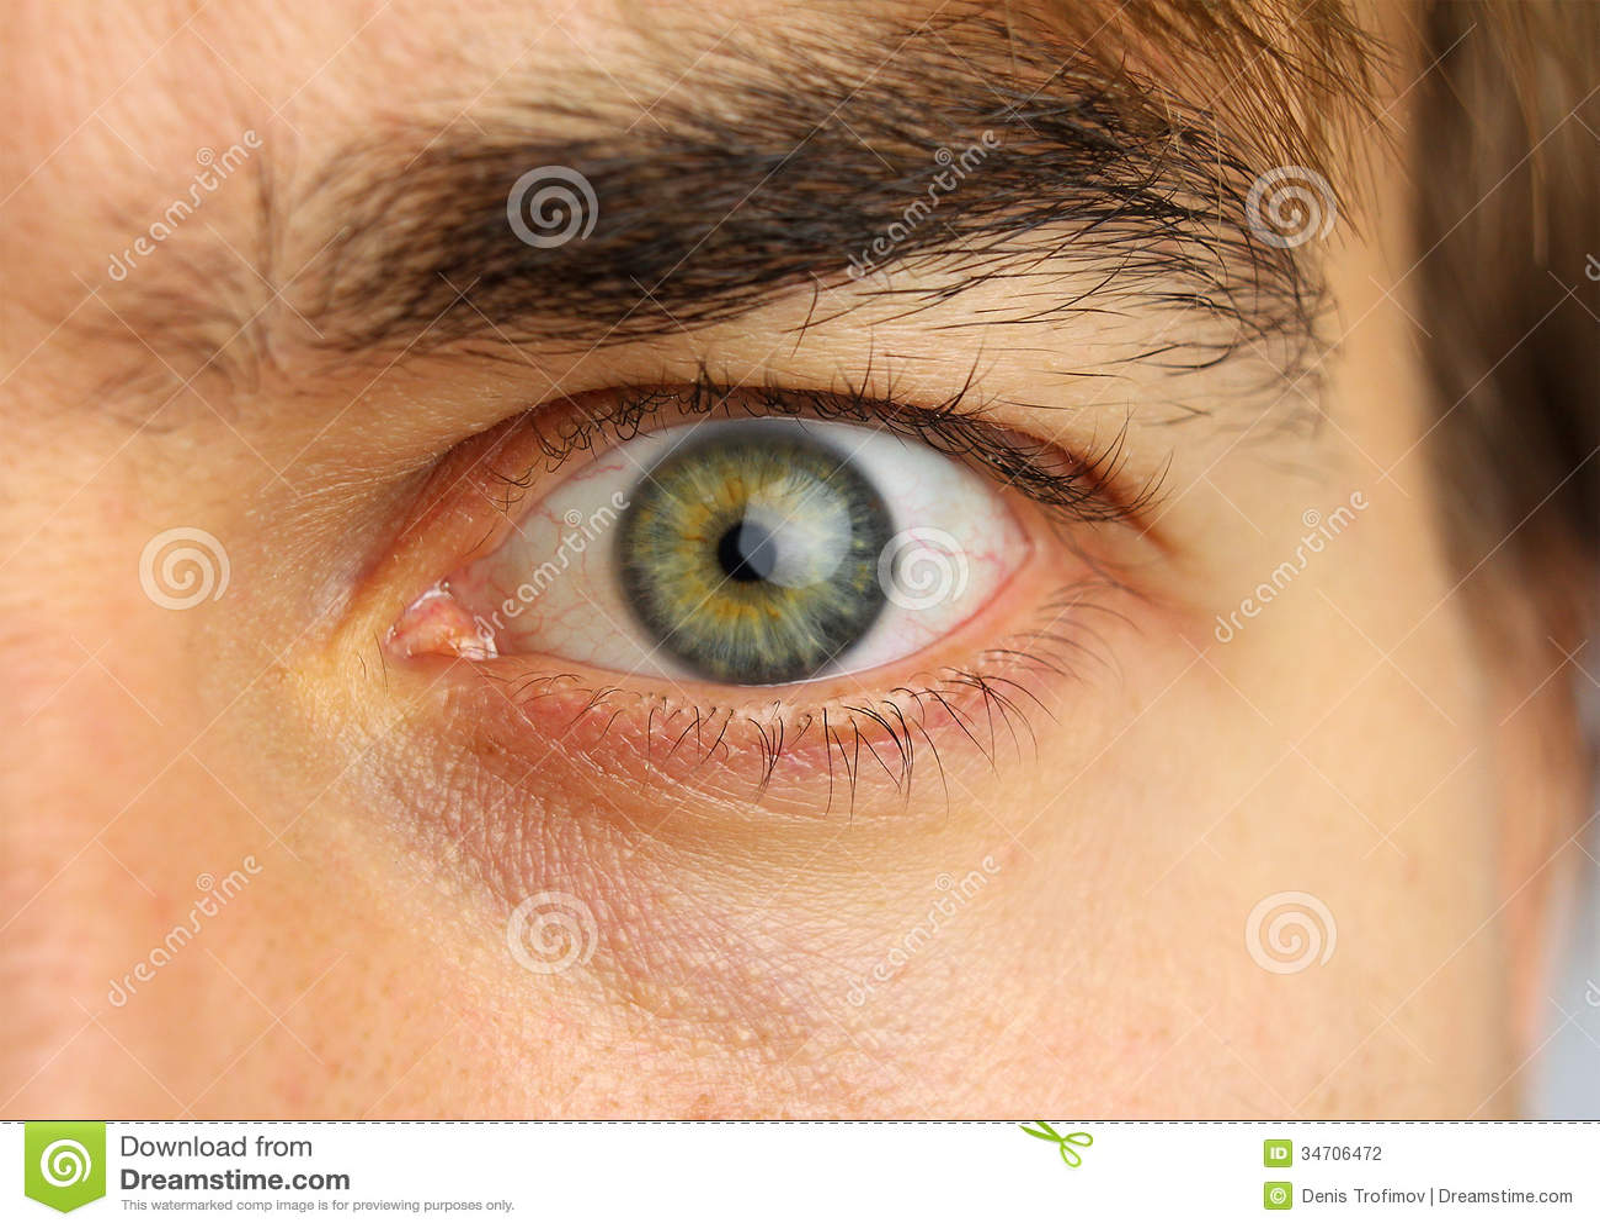 Human Eye And Eyebrow Close Up Stock Photo Image 34706472